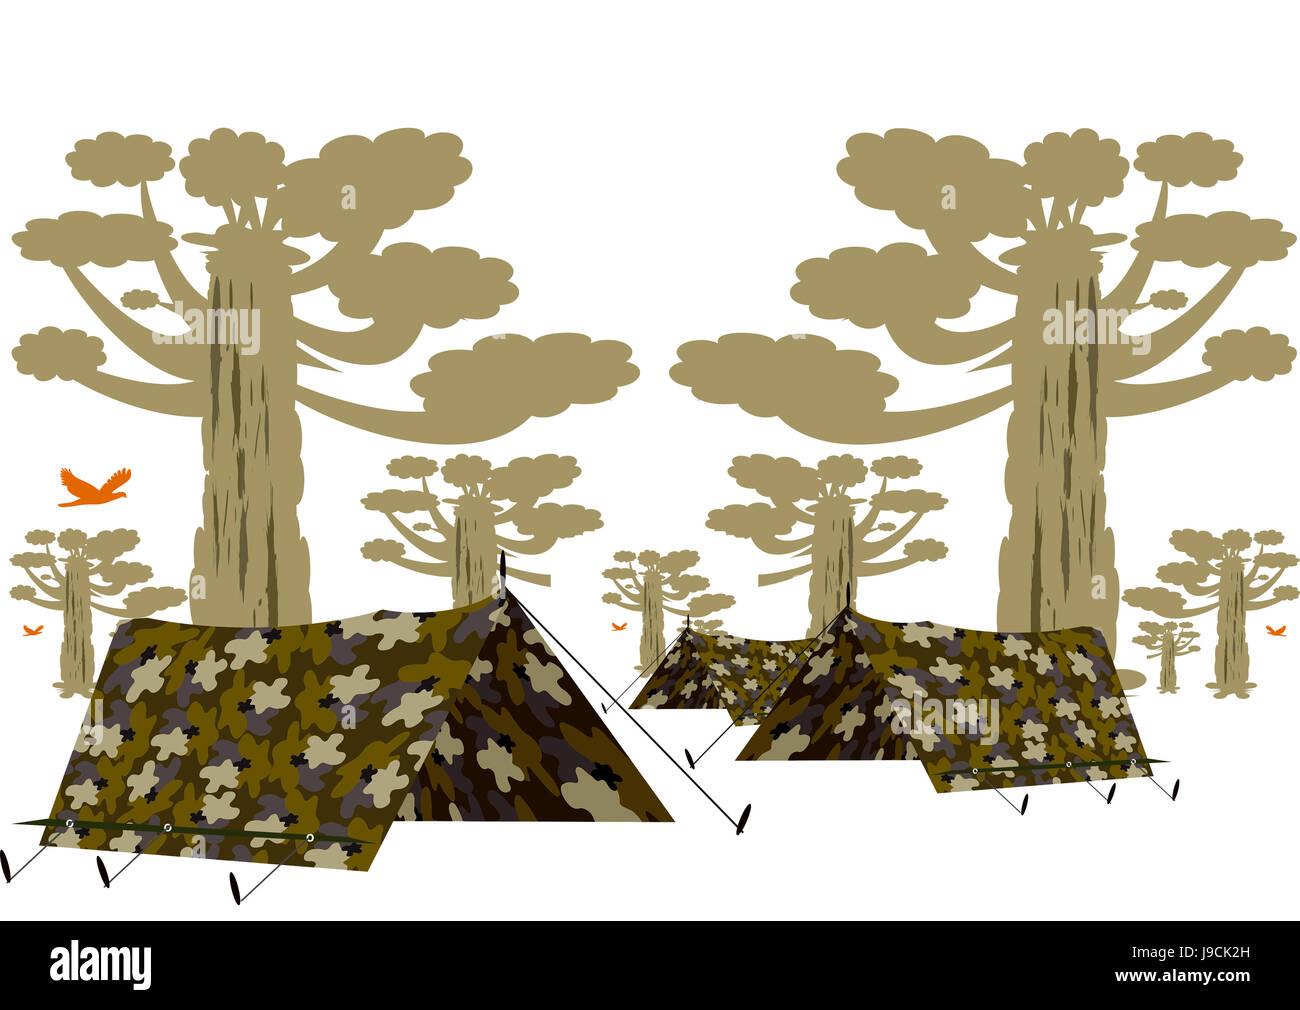 environment, enviroment, tree, trees, hill, holiday, vacation, holidays, - Stock Image